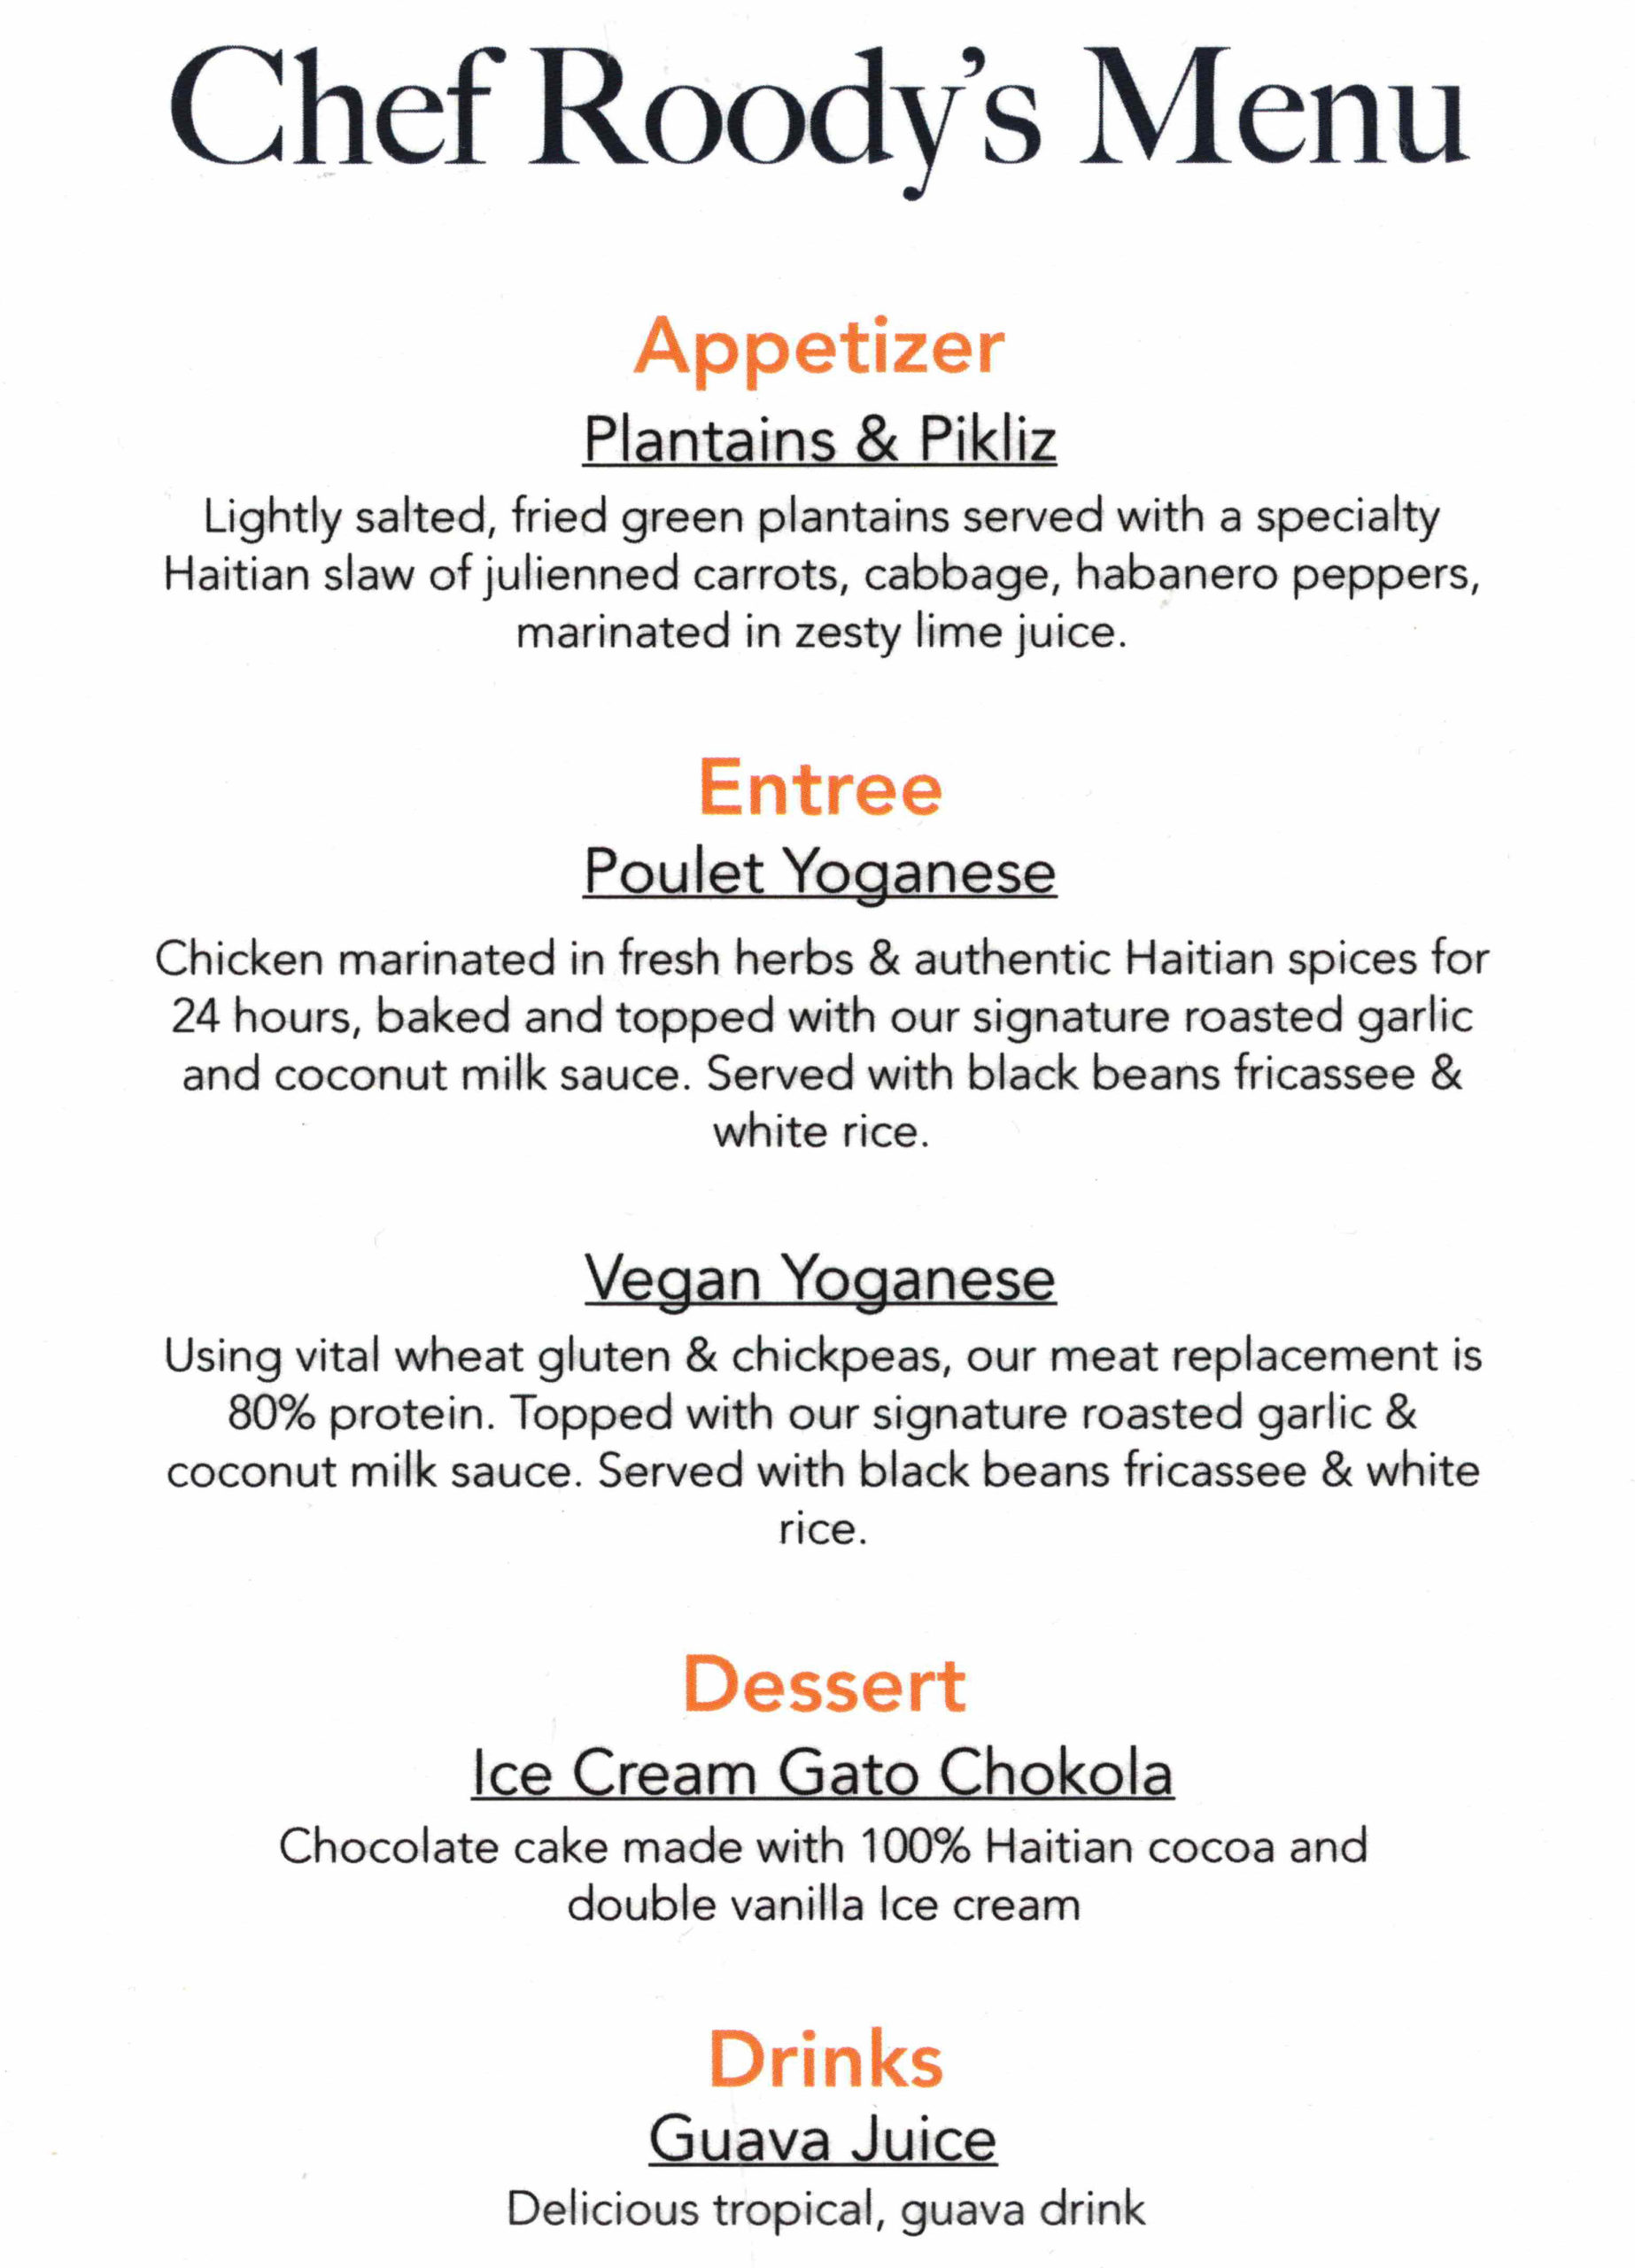 Chefpanzee Makaya catering menu